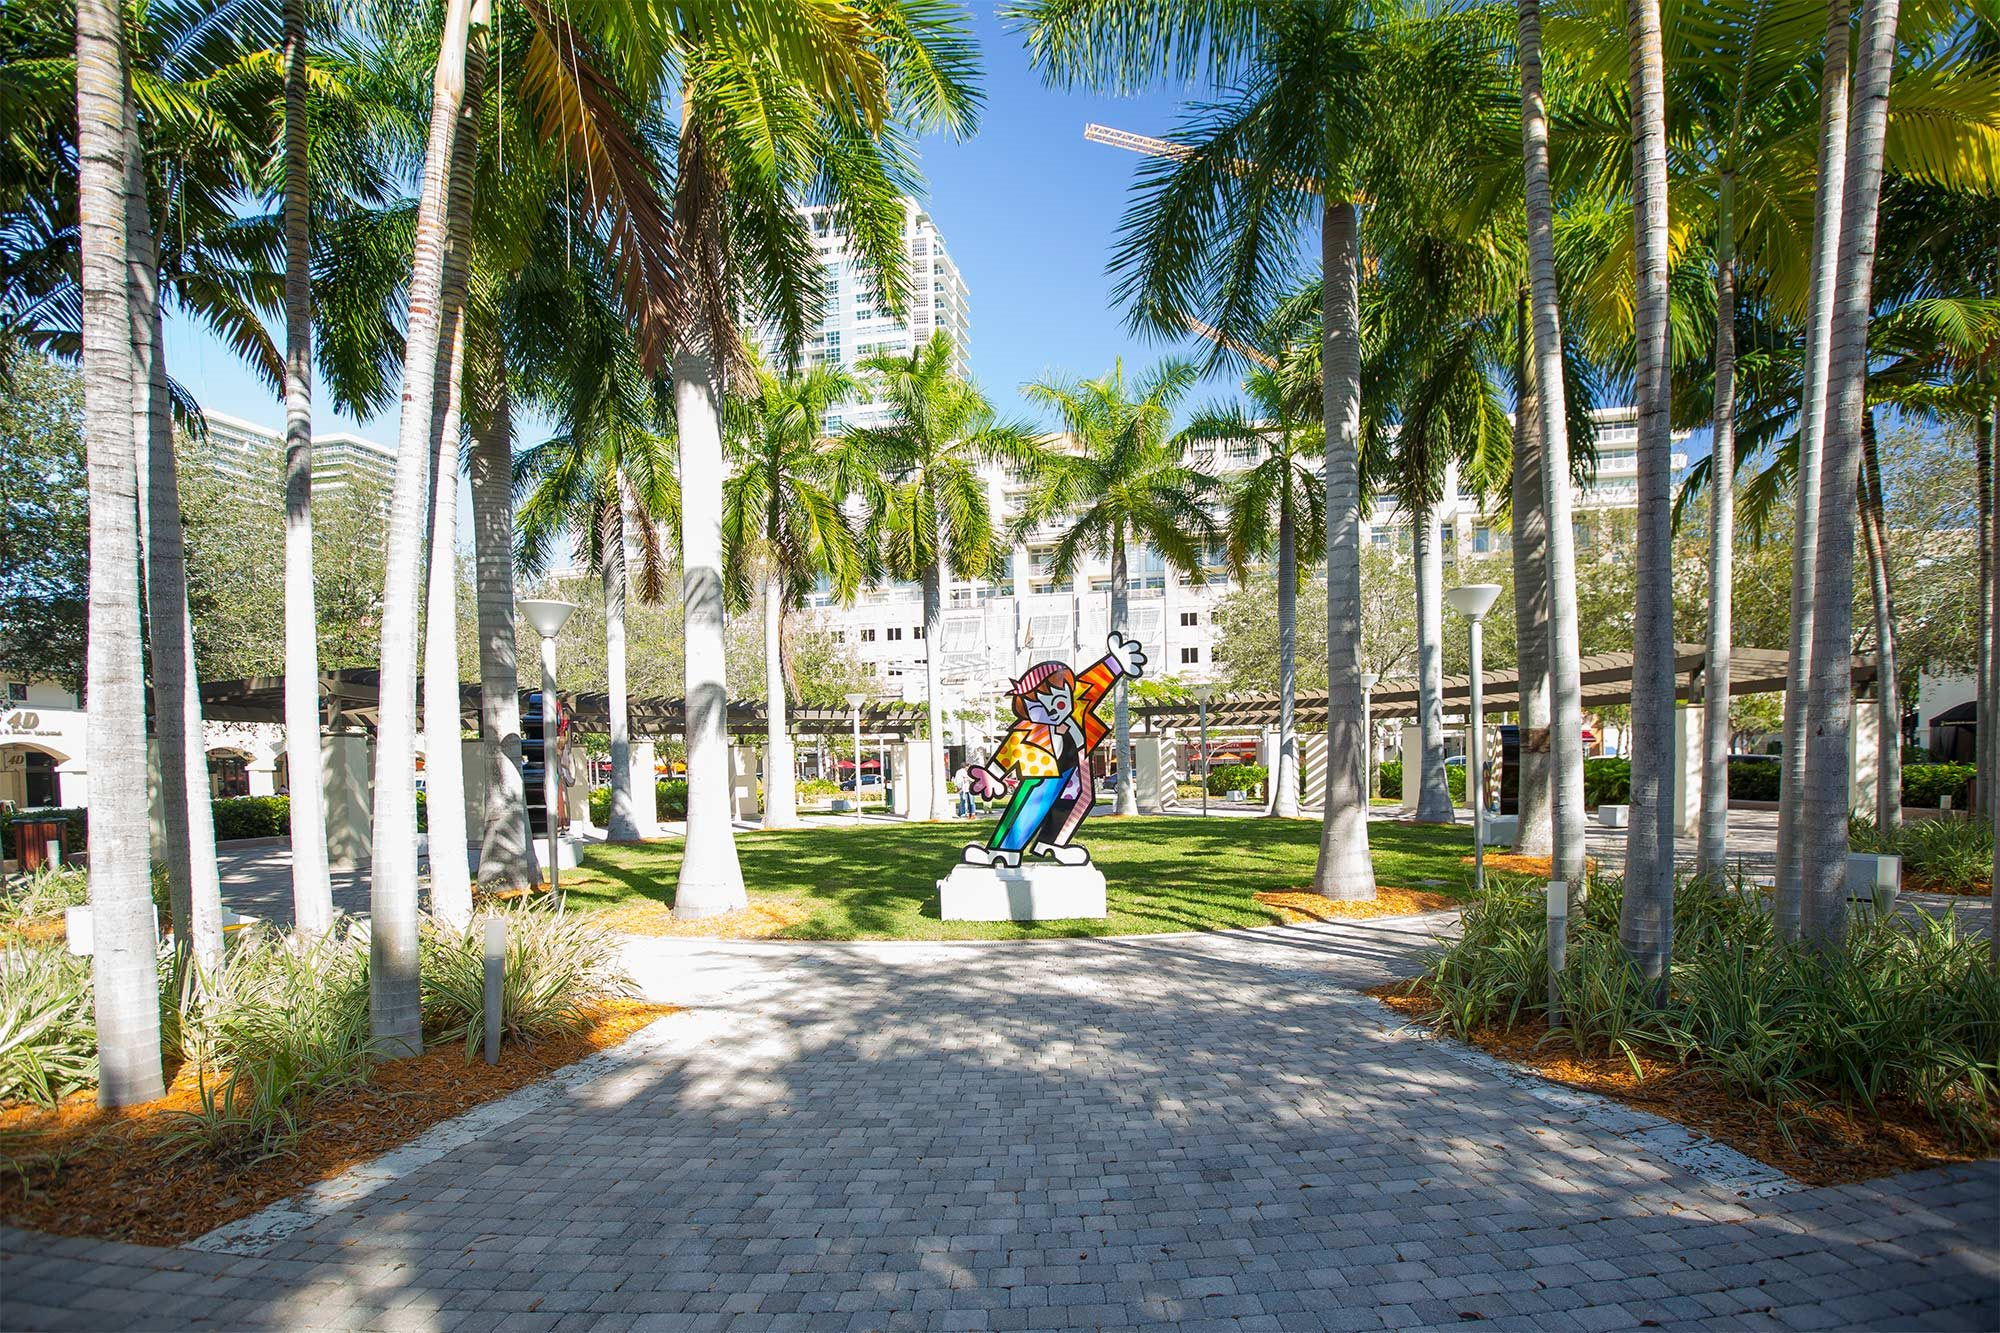 Miami photogallery 33